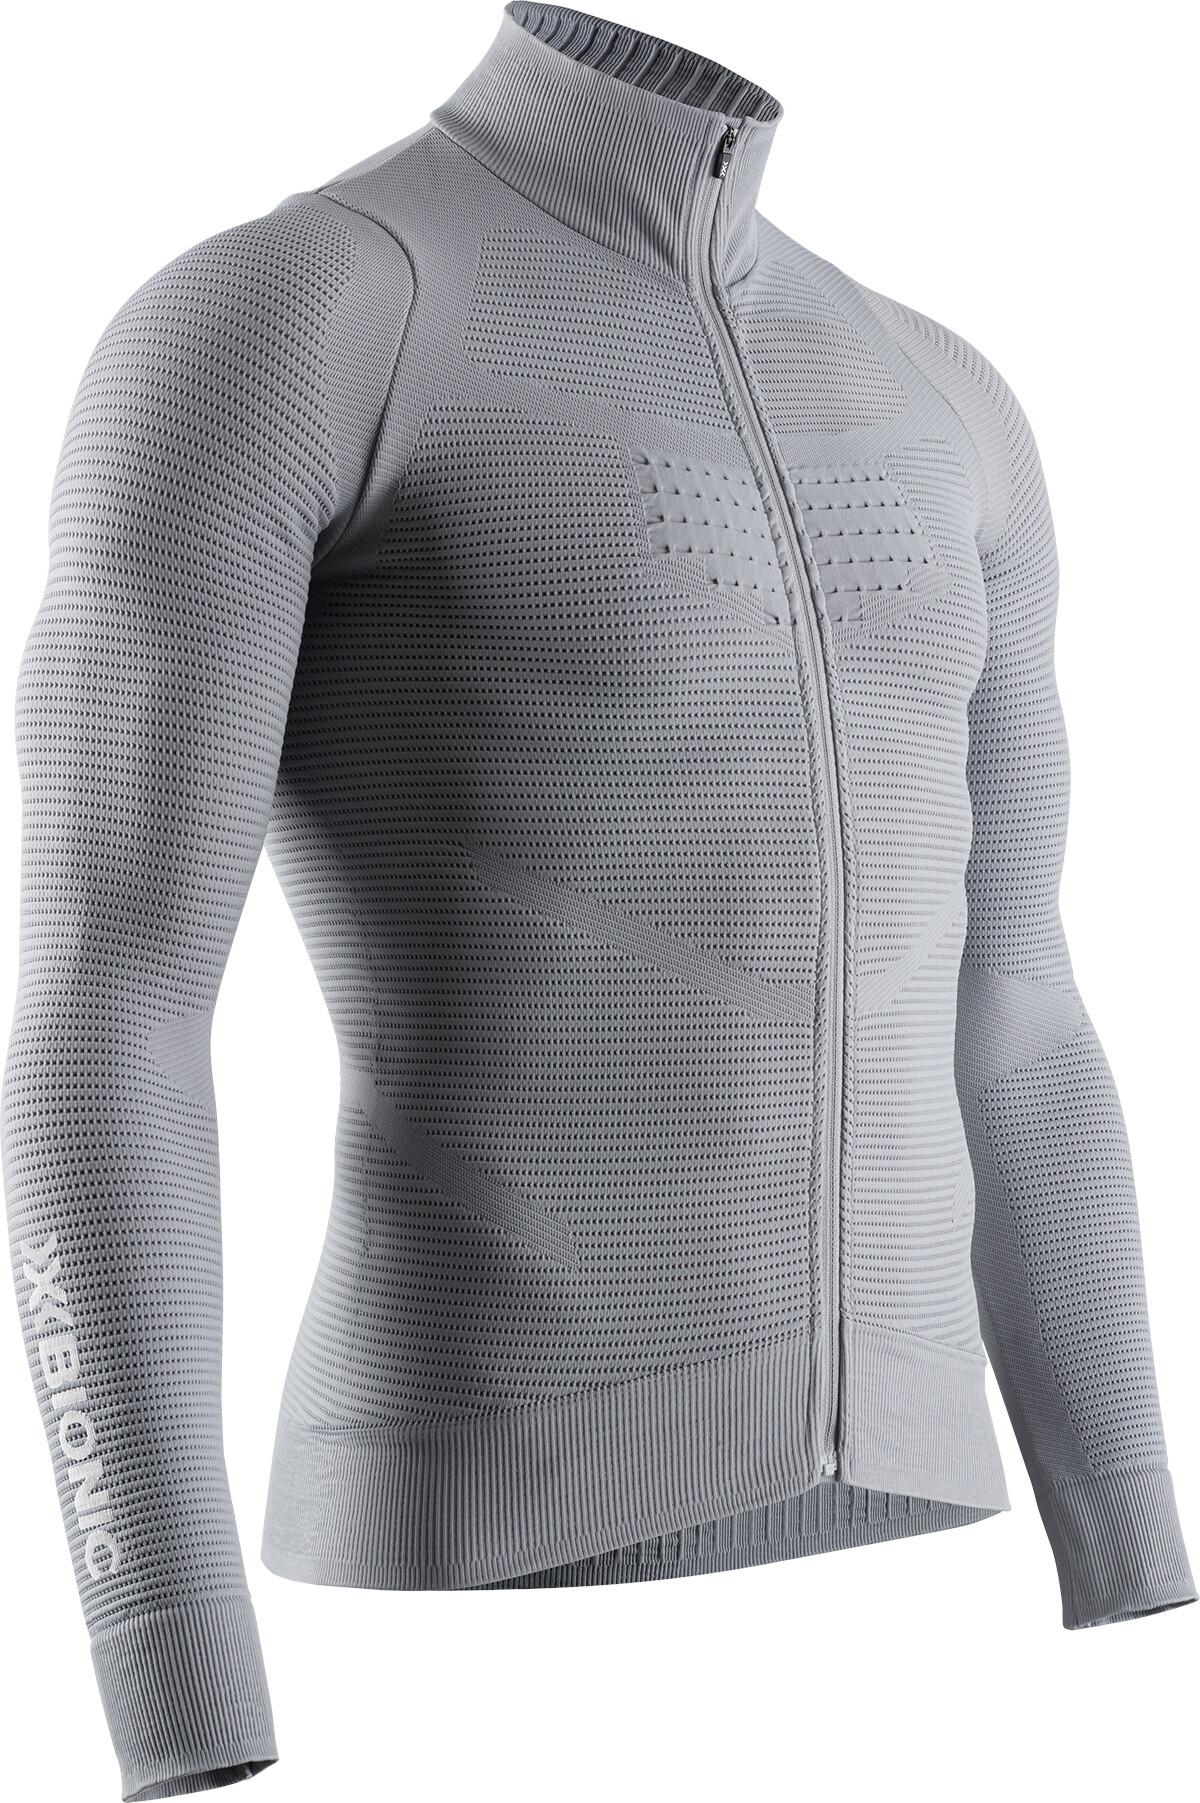 X Bionic Instructor Jacke dolomite greyarctic white